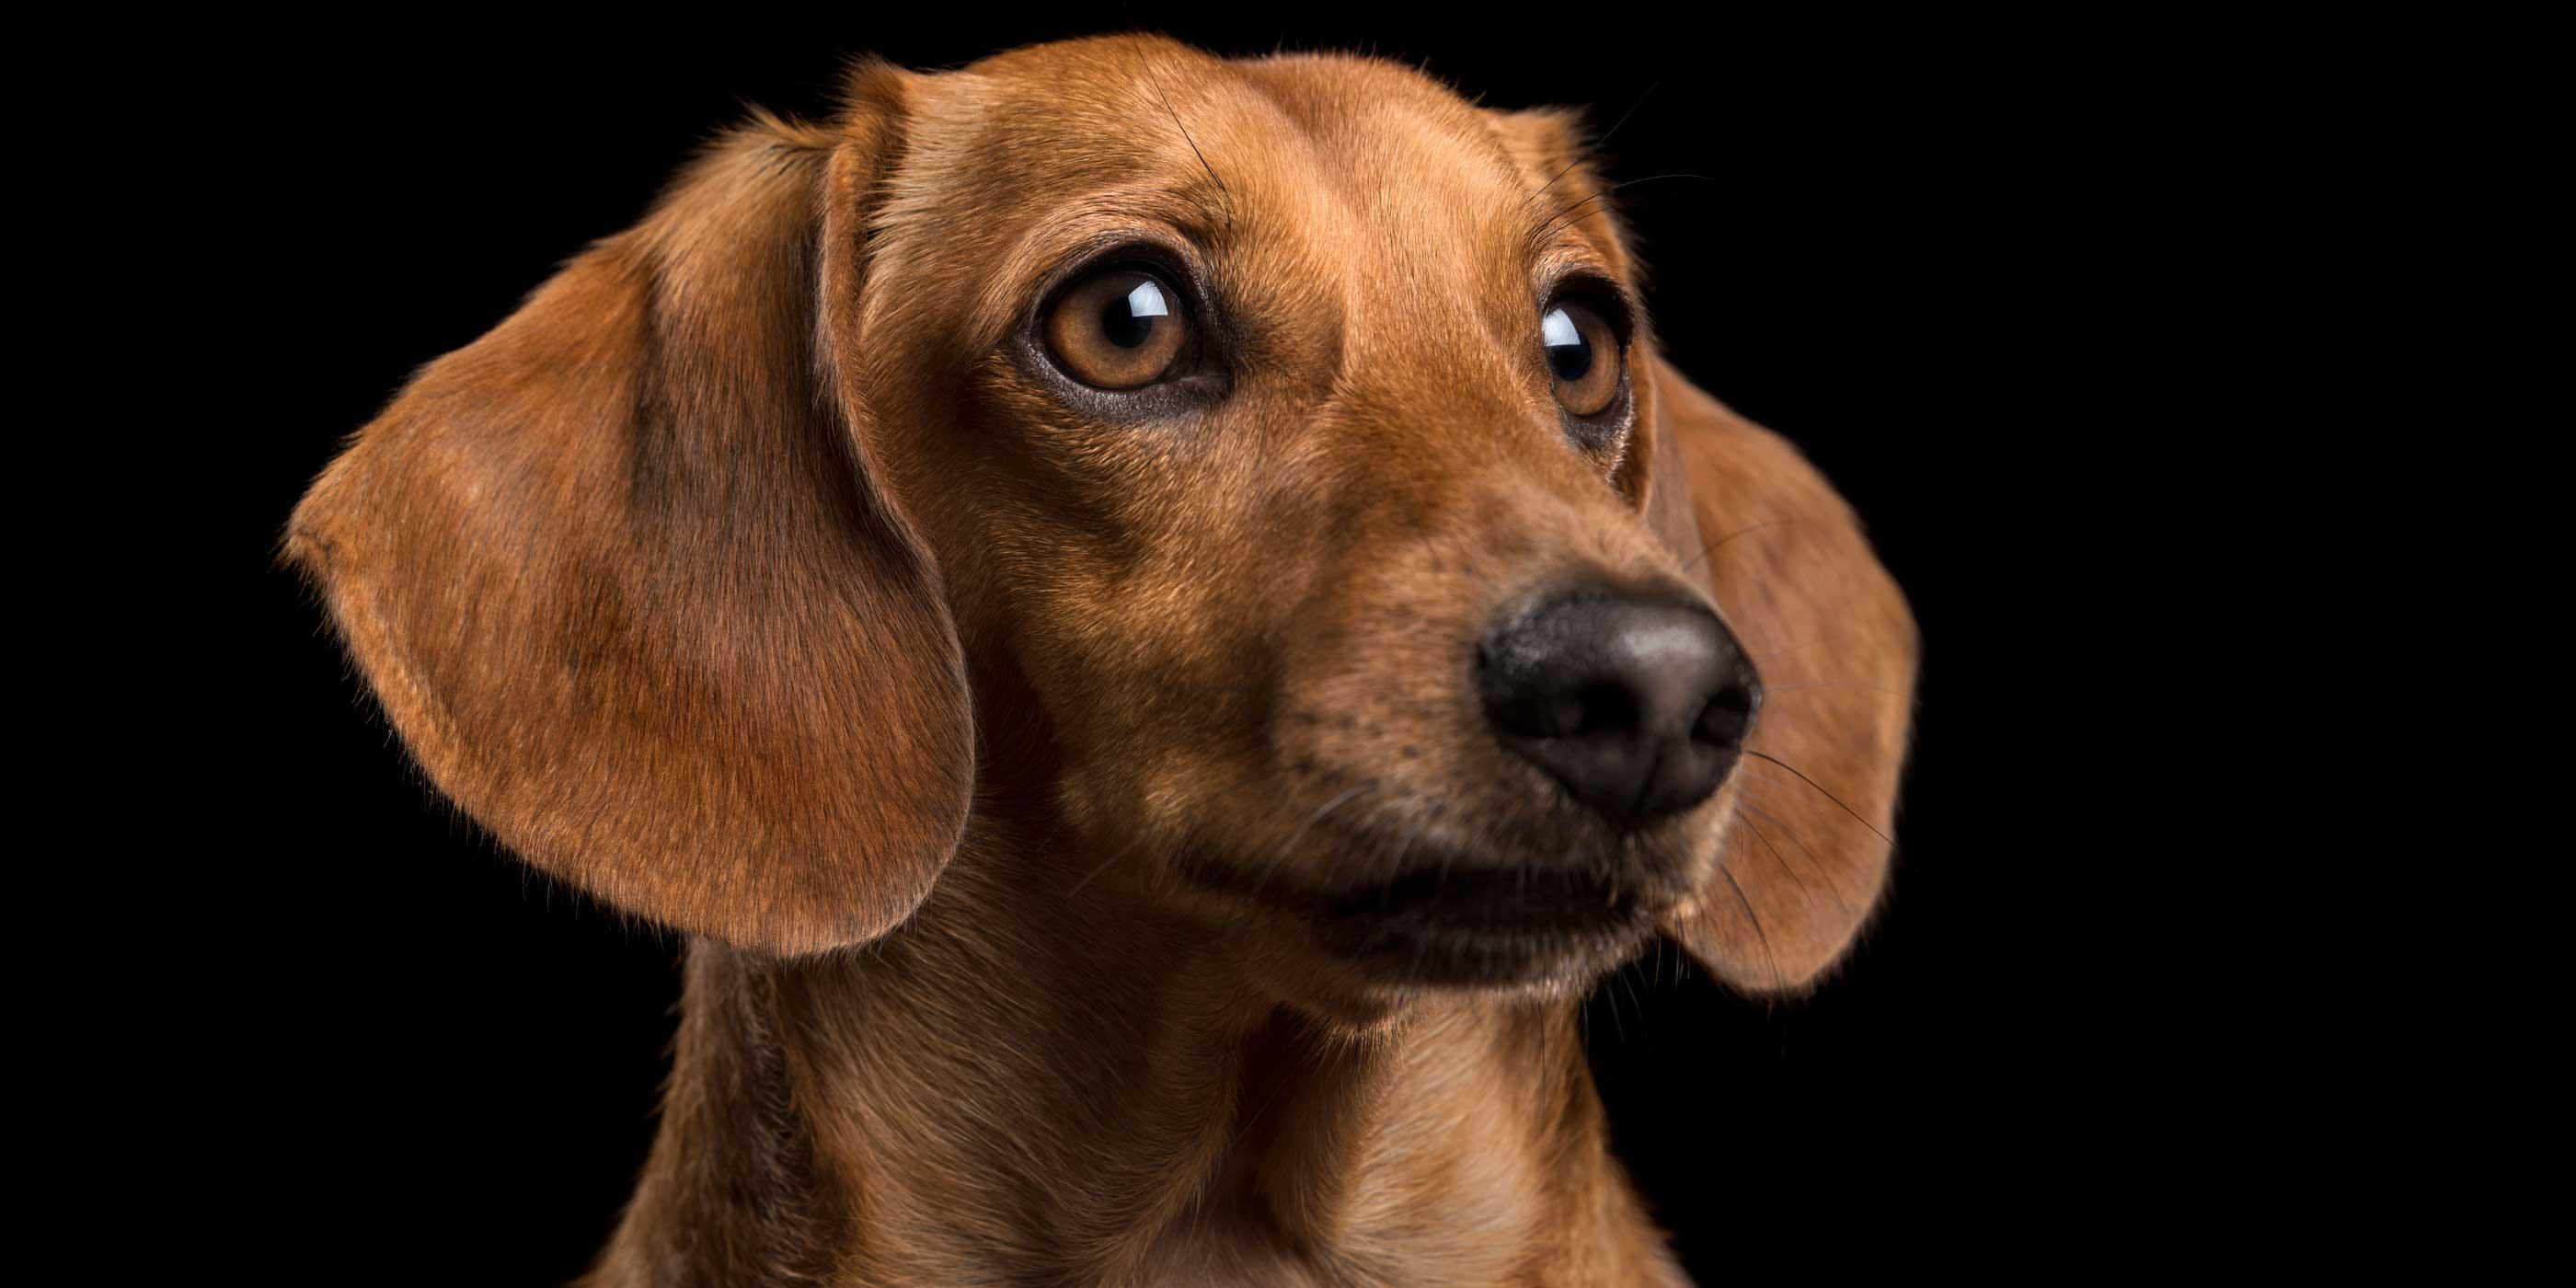 regal profile of mini tan dachshund